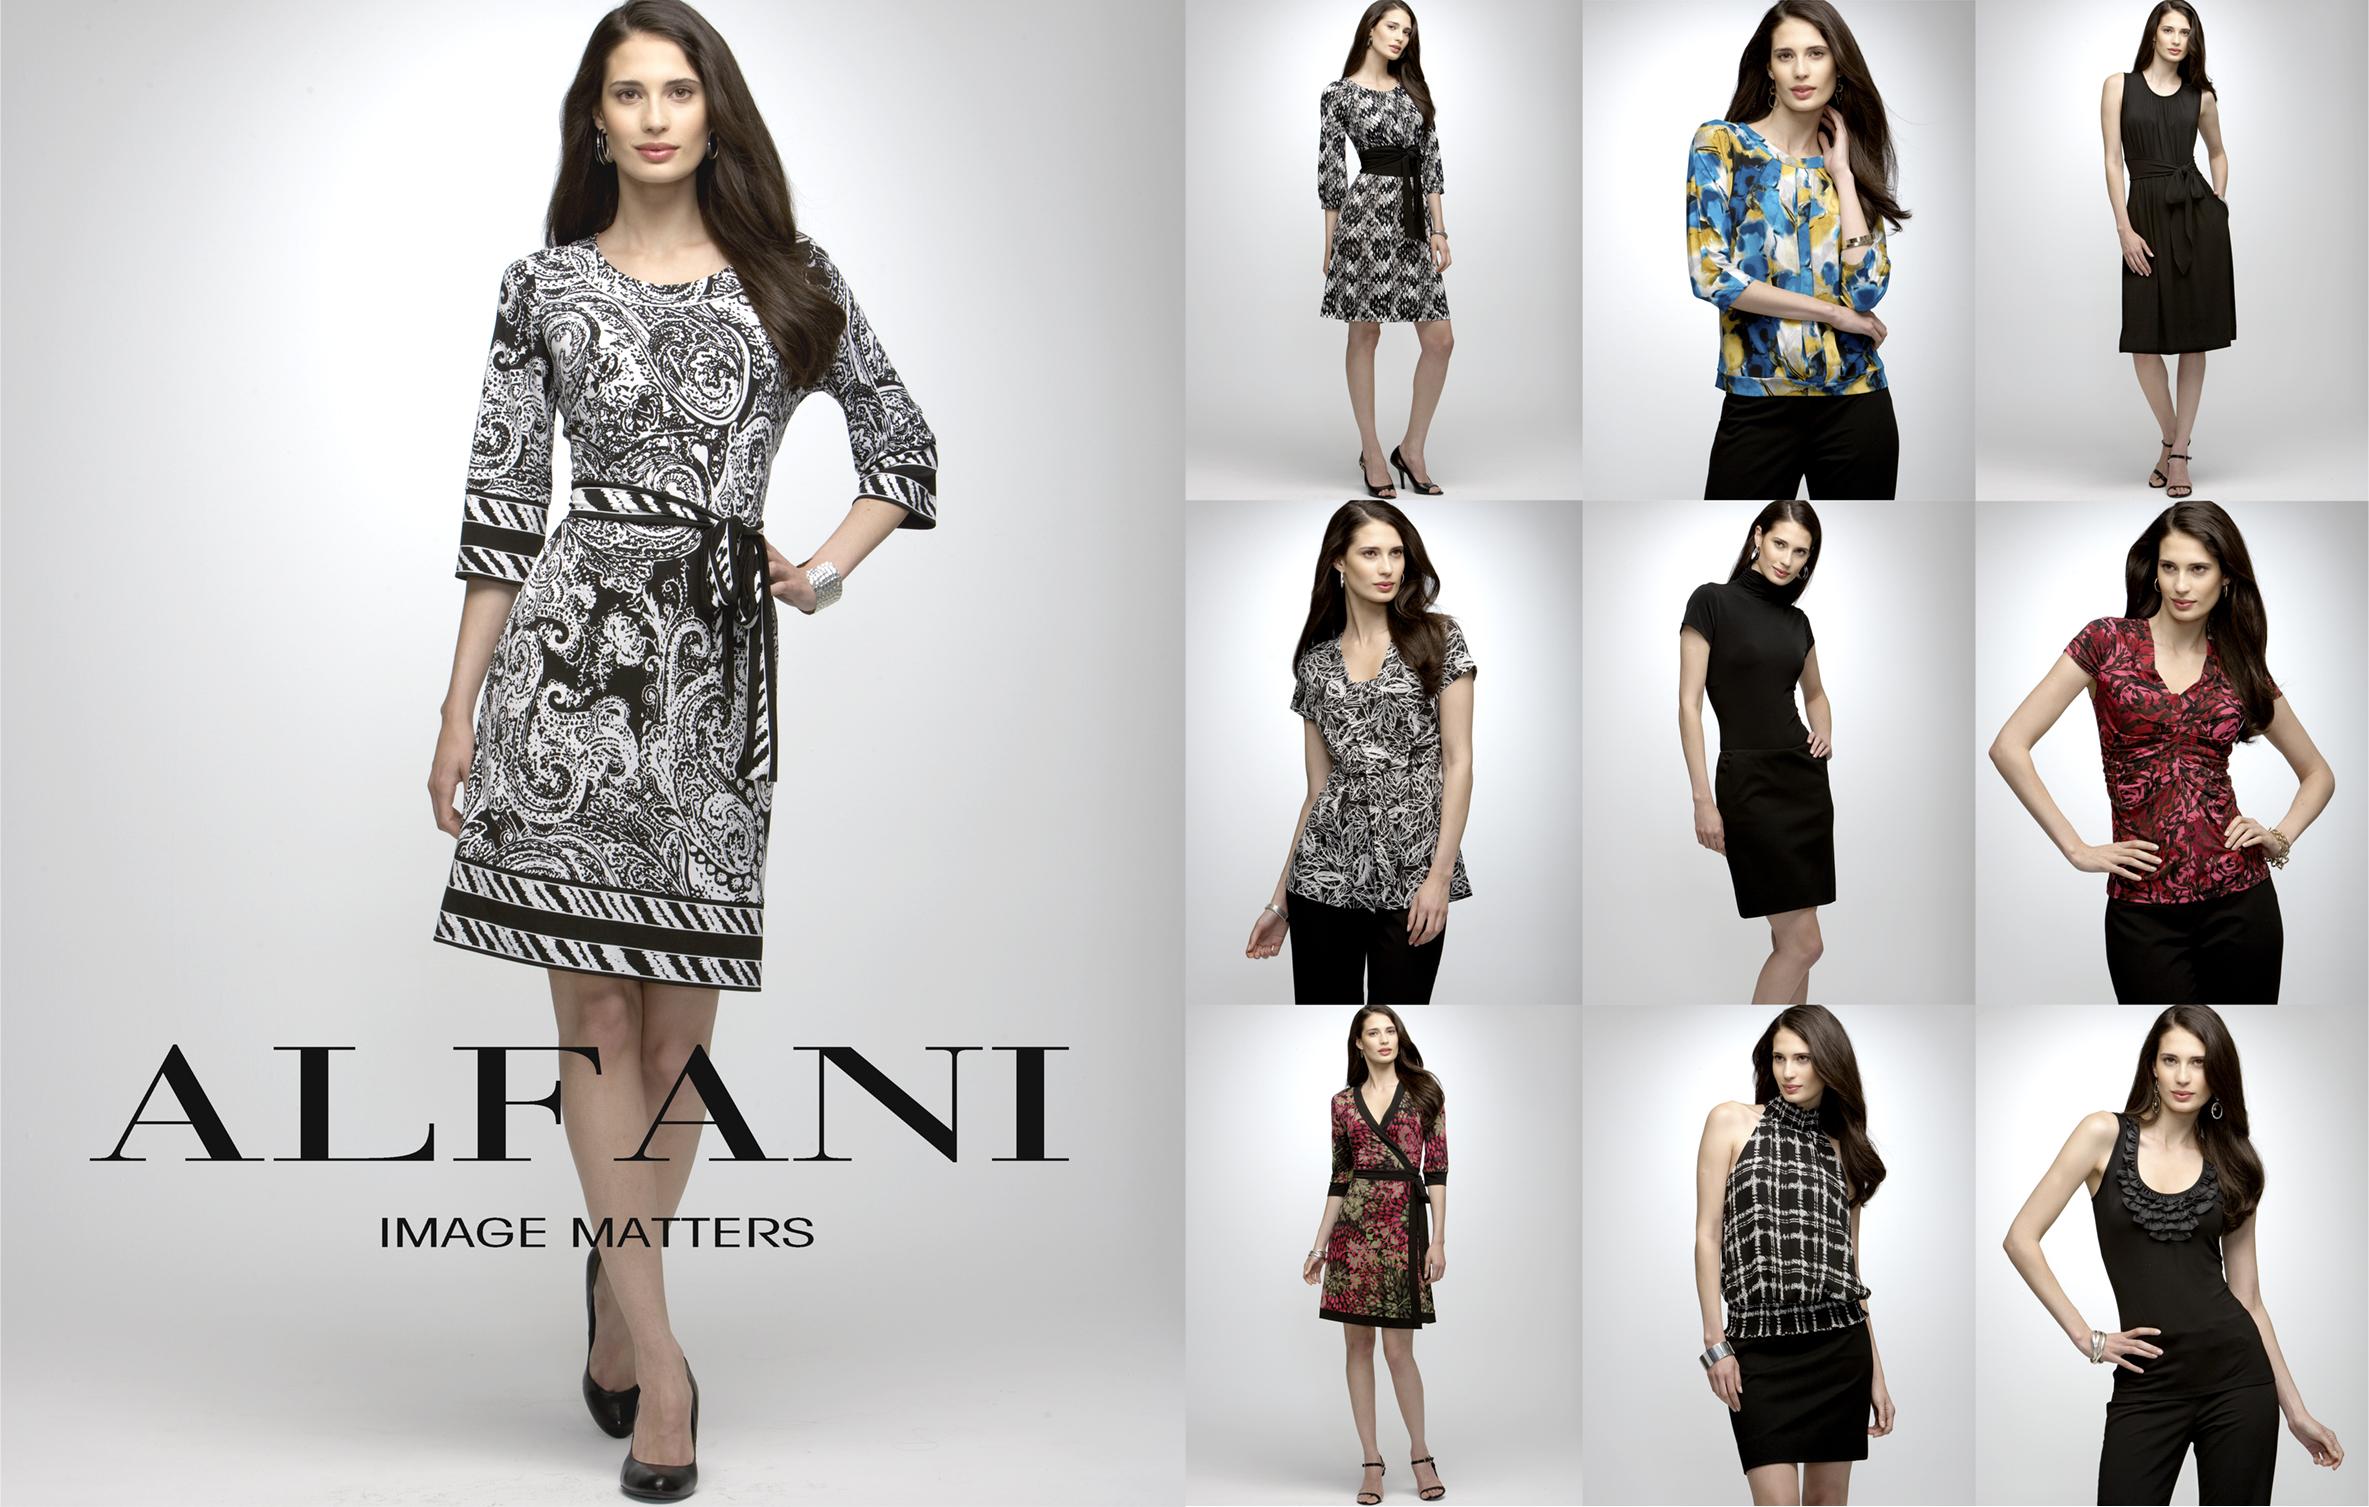 Alfani_01_DOT_COM_TEMPLATE.jpg